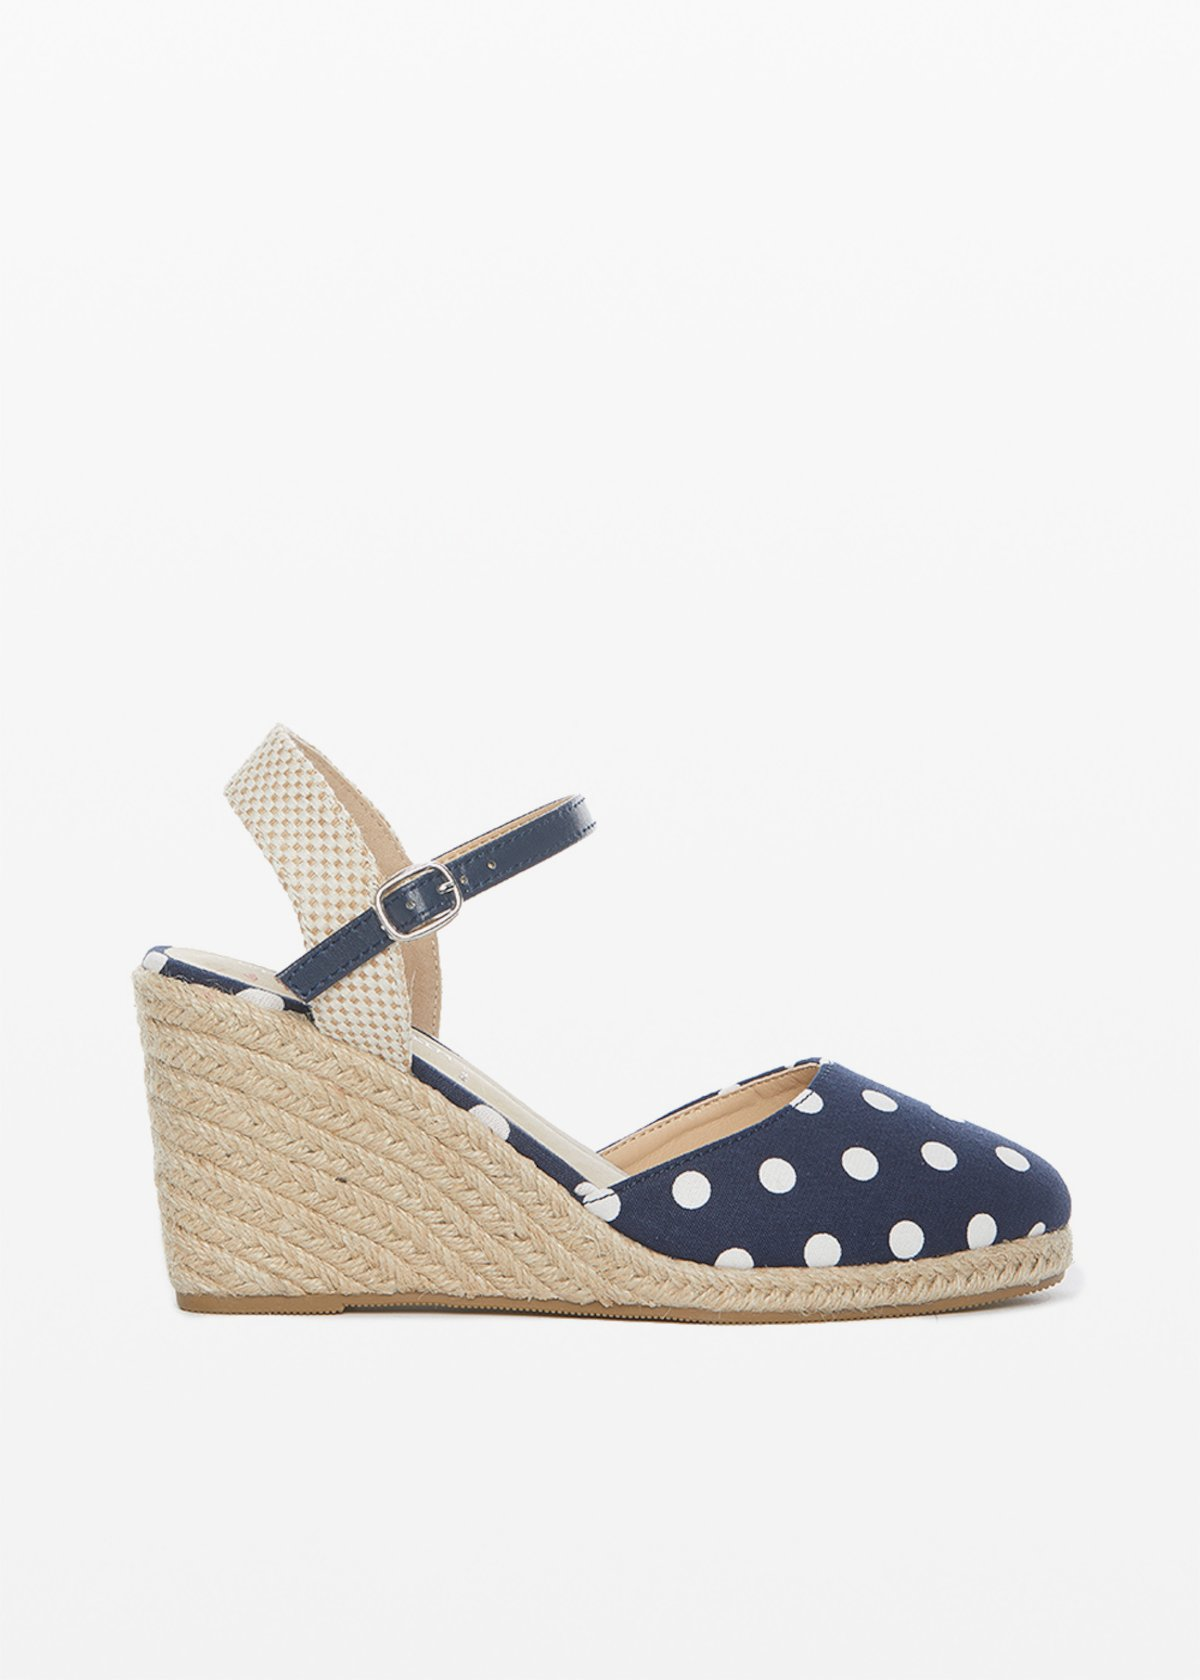 Sirya sandals Polka dot pattern and wedge - Dark Blue Pois - Woman